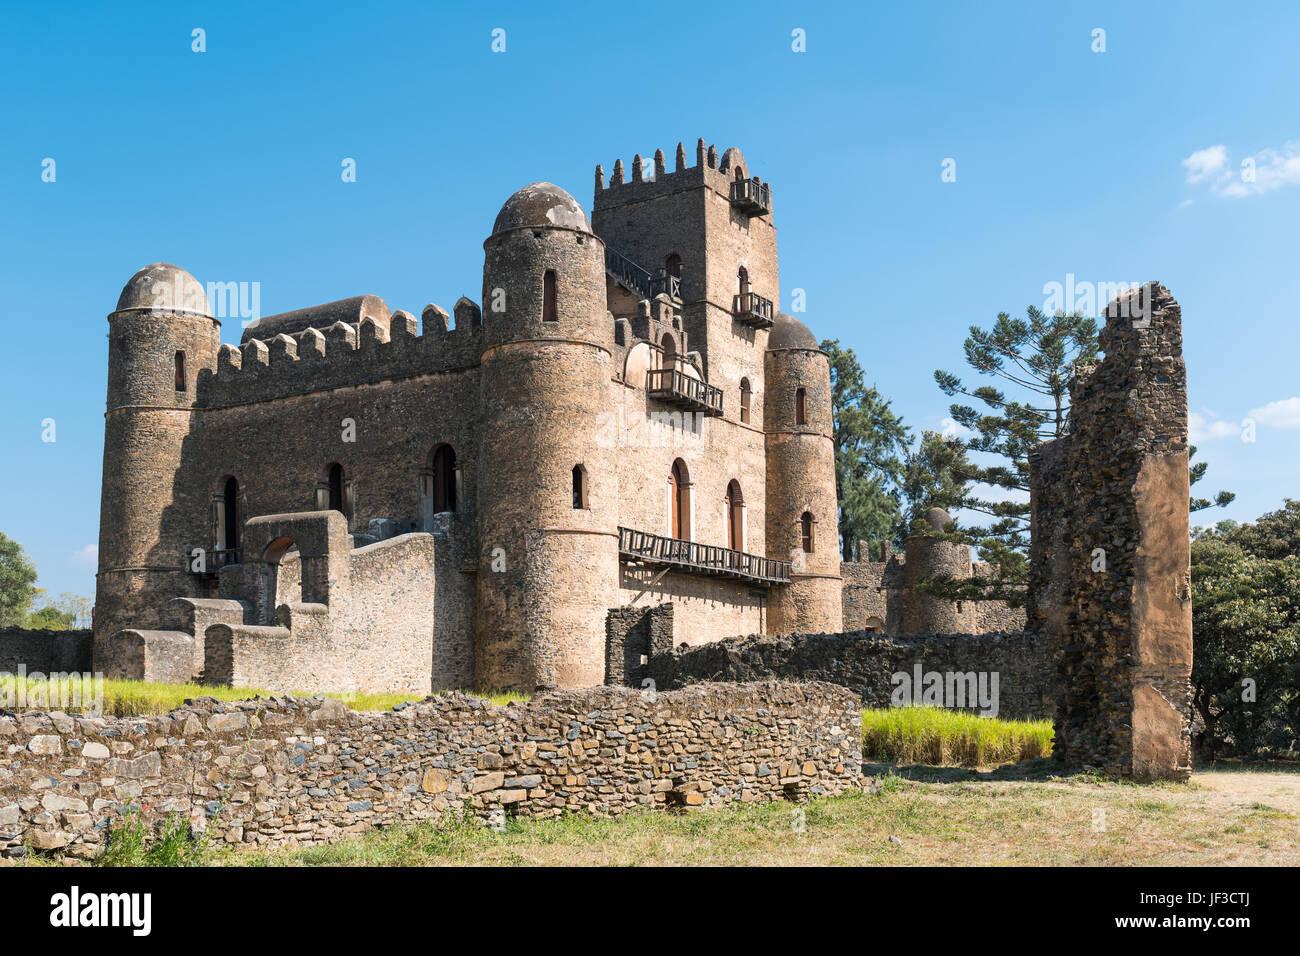 Ethiopia, Gondar, the Emperor's palace - Stock Image